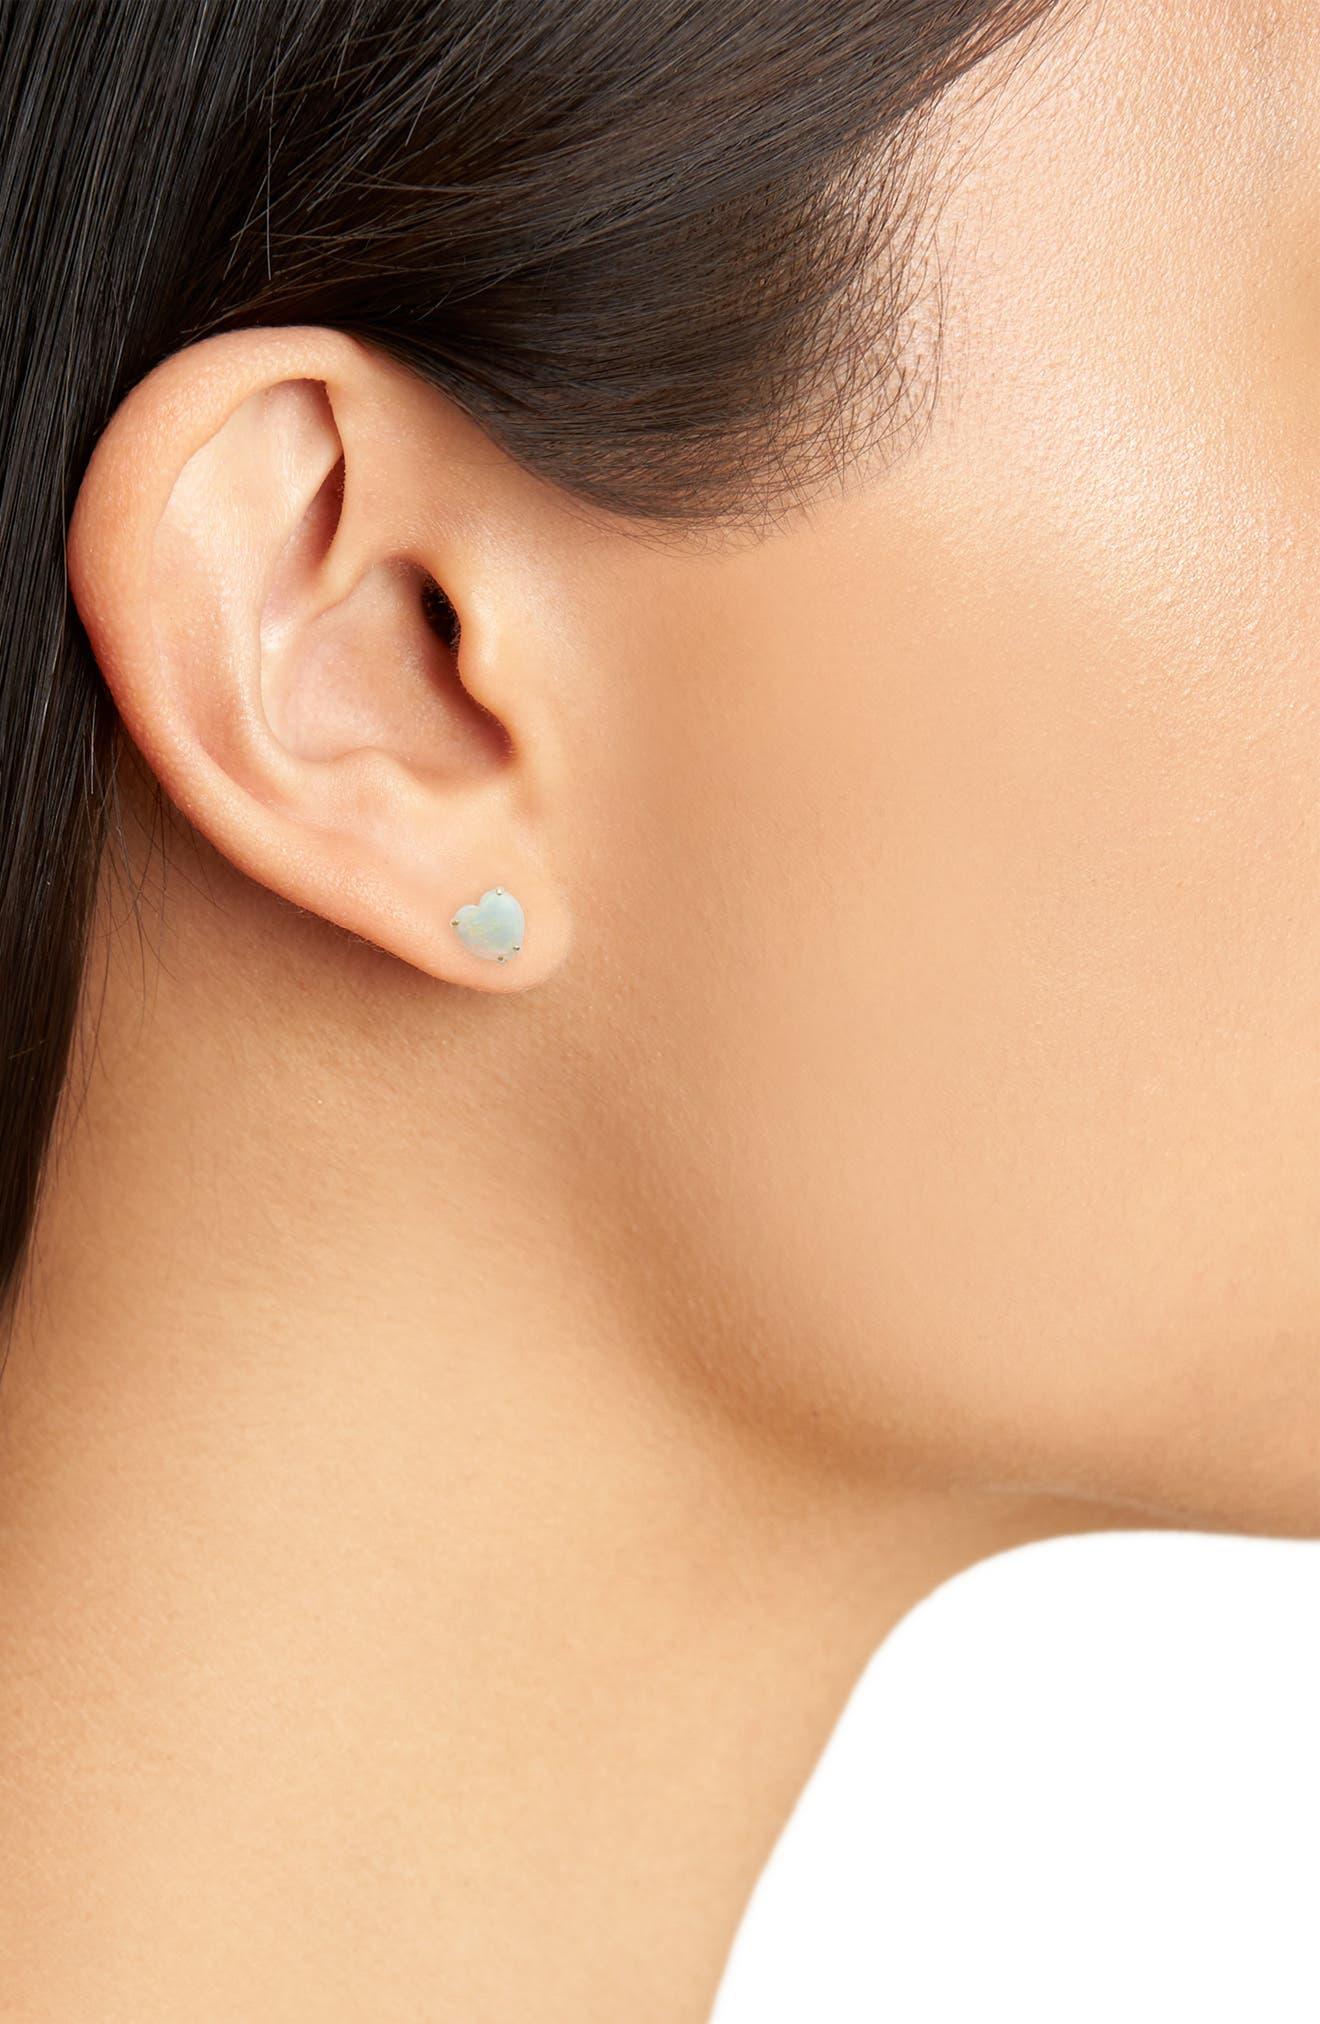 Diamond & Semiprecious Stone Stud Earrings,                             Alternate thumbnail 2, color,                             710